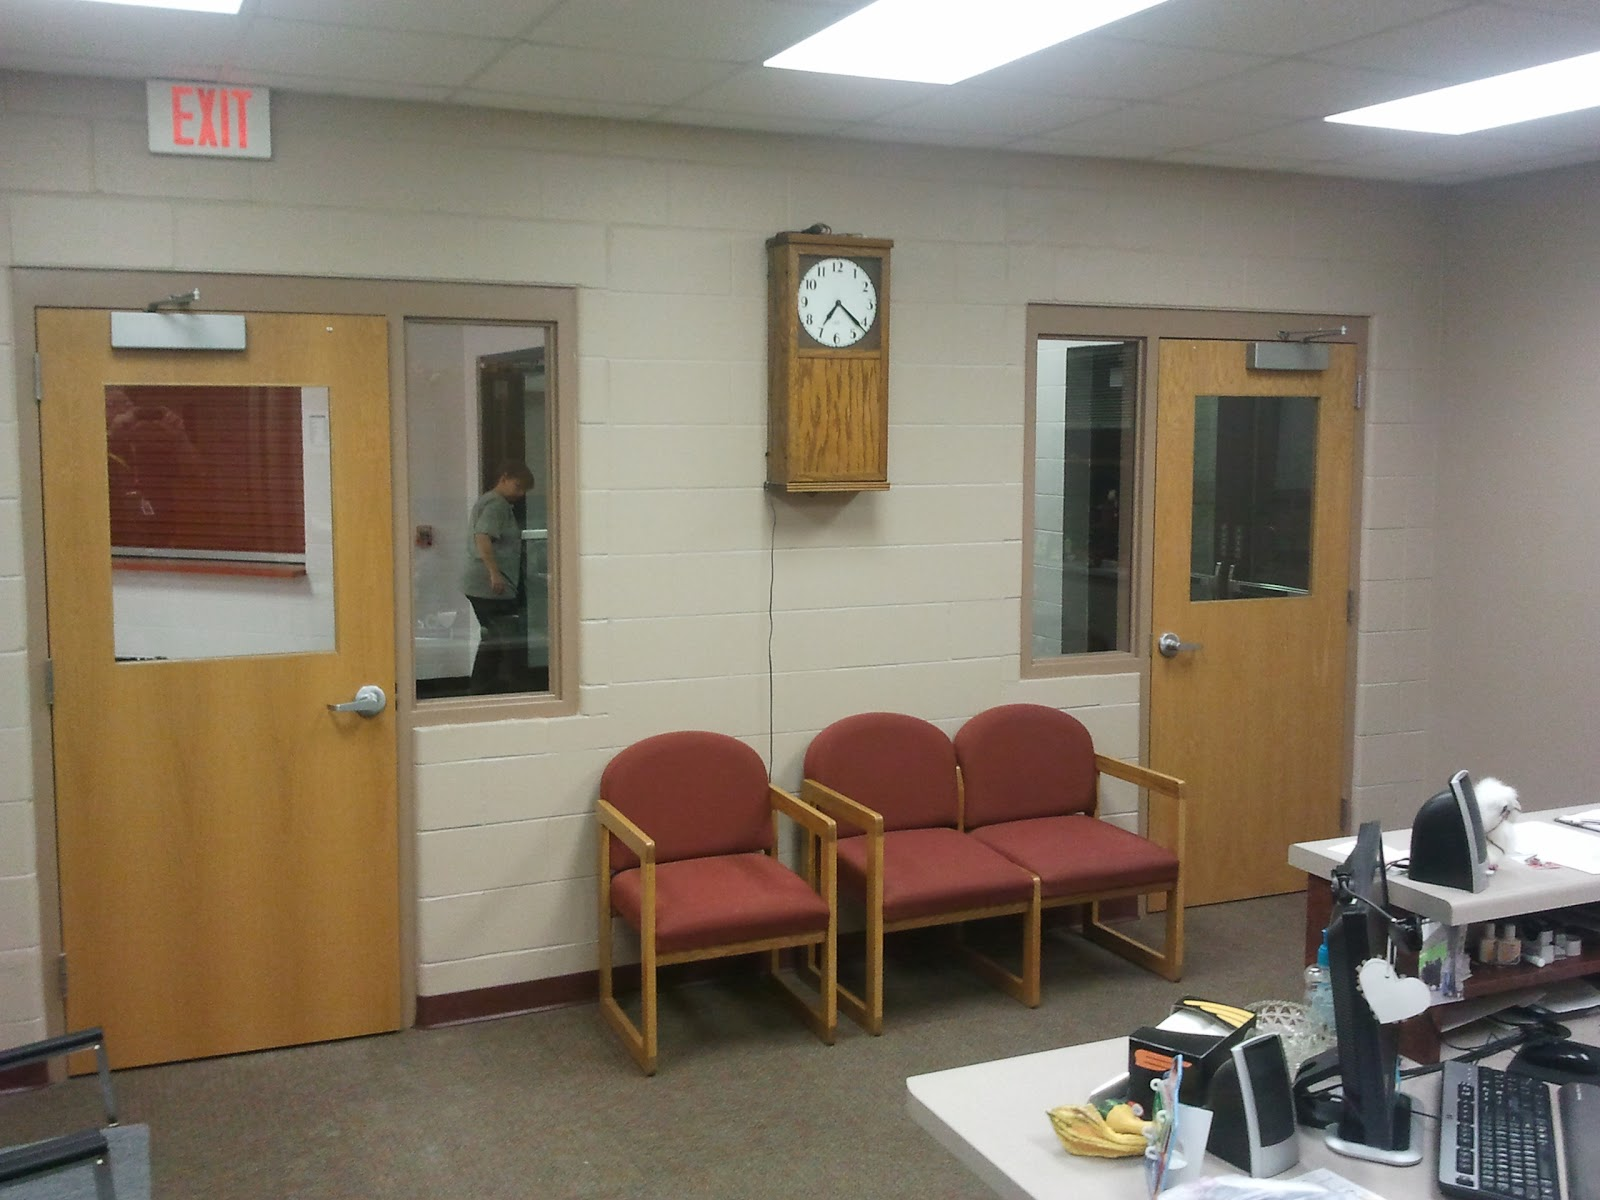 Cashton Elementary: The New Normal for School Entrances?